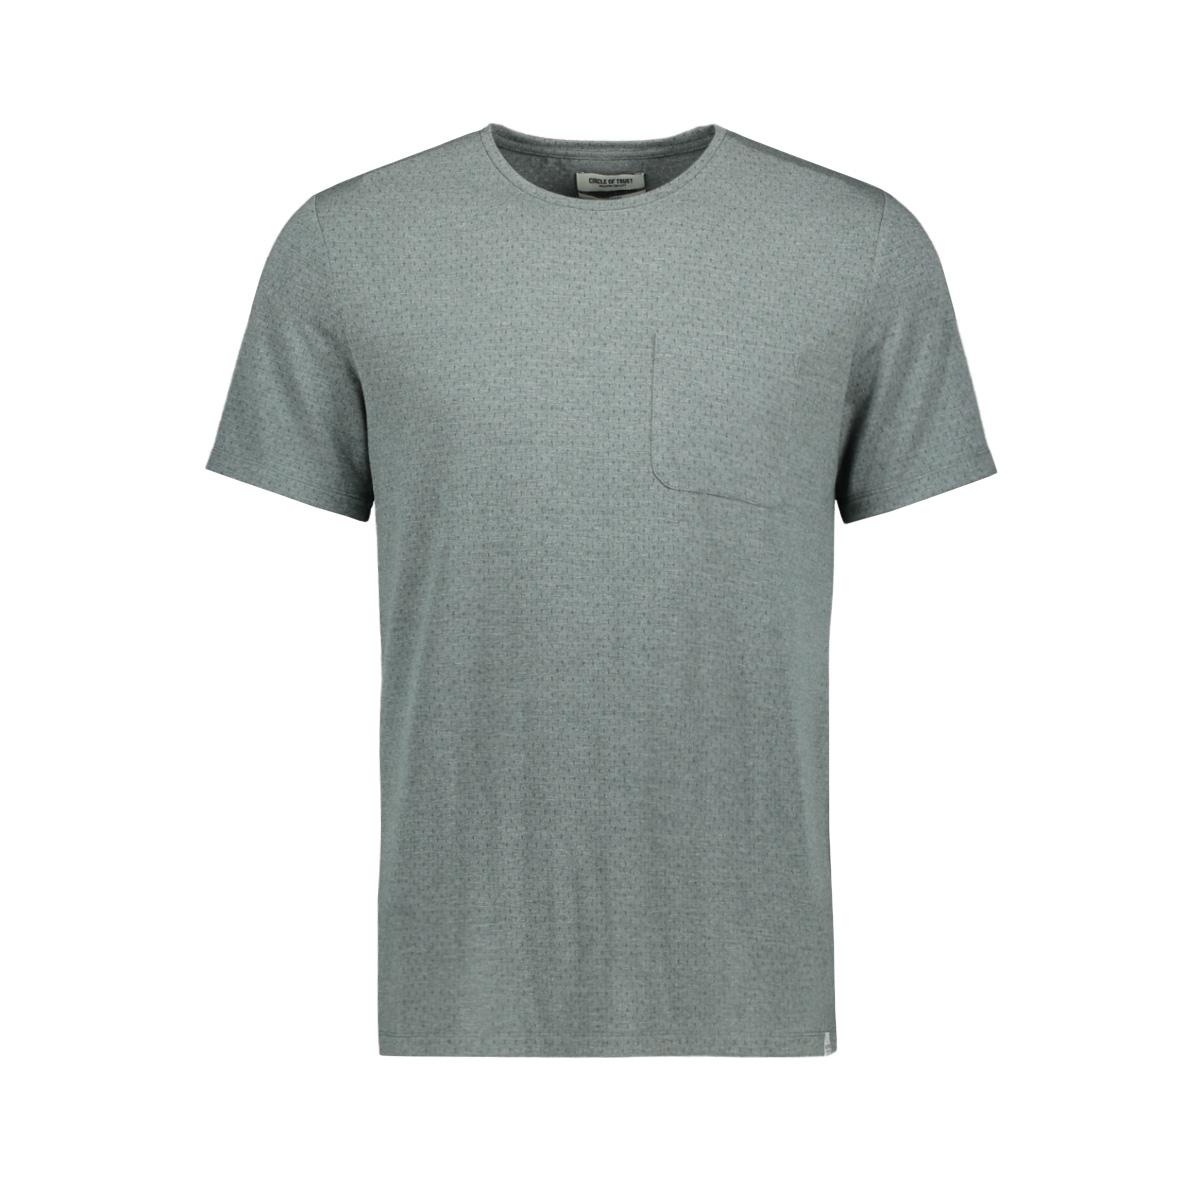 tor t shirt h20 28 circle of trust t-shirt 9460 sea green